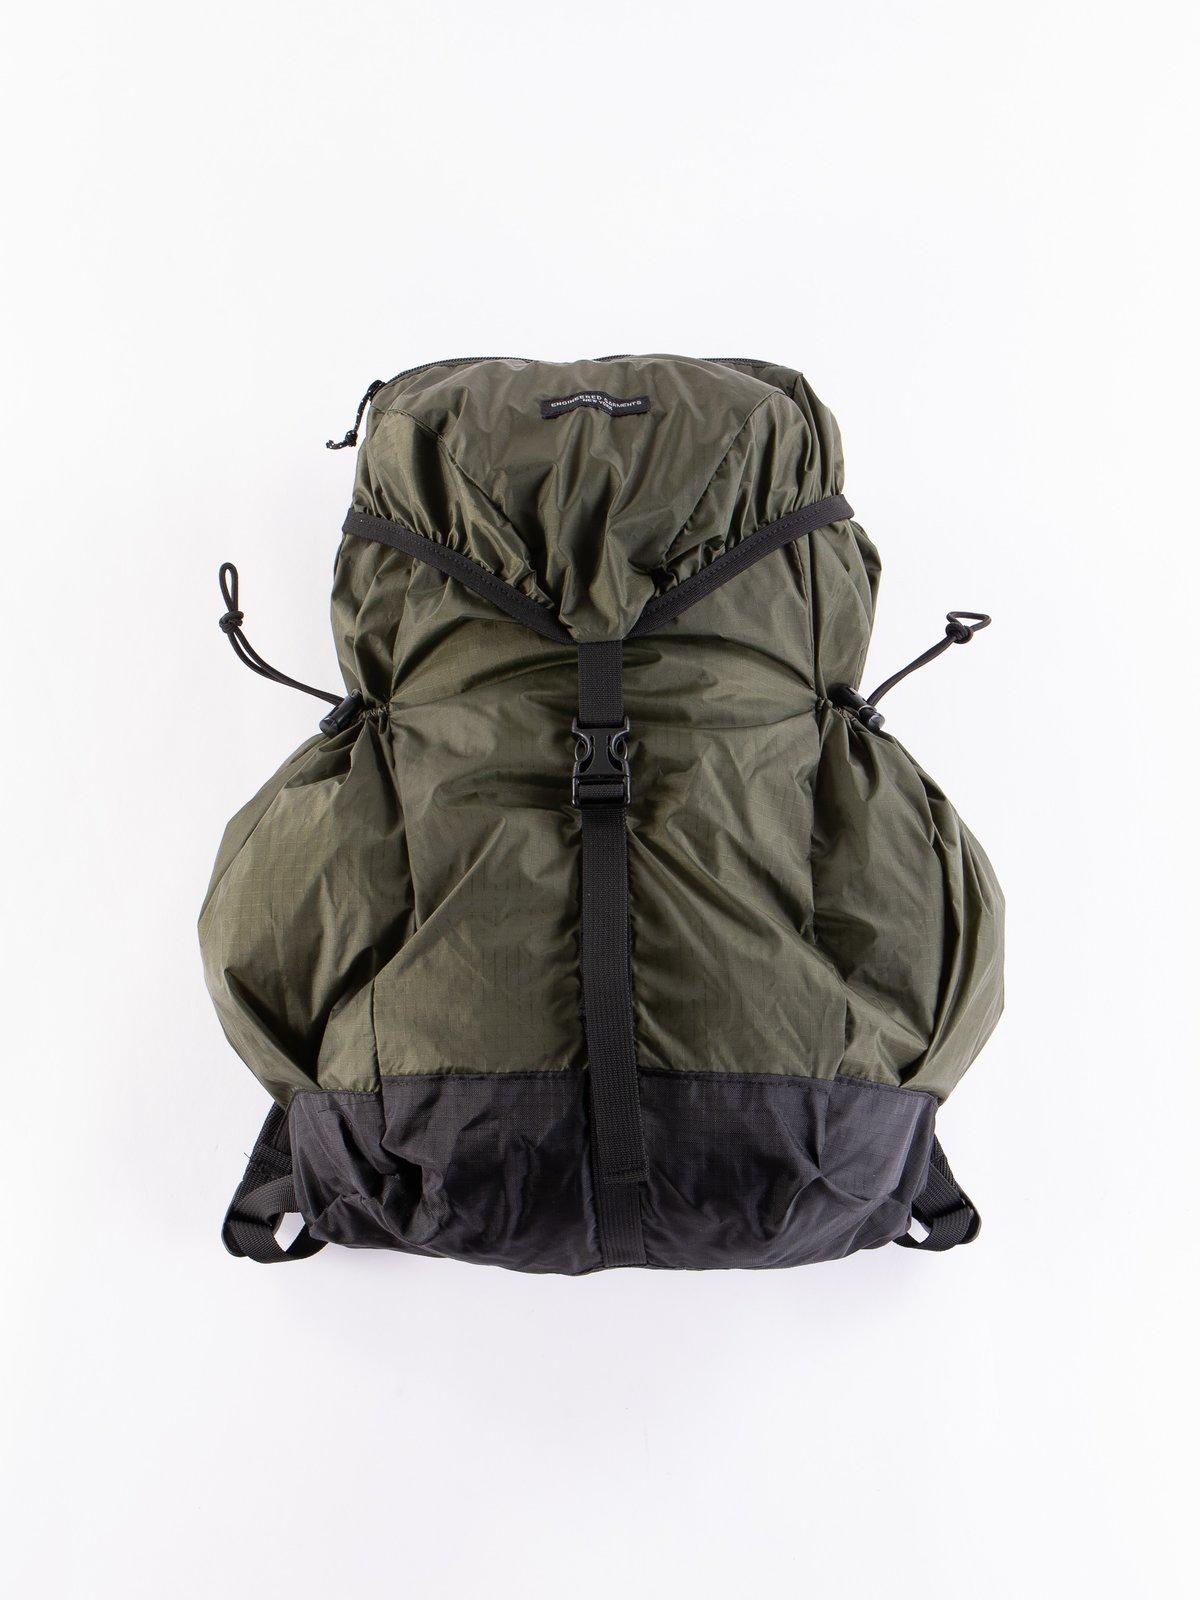 Olive Nylon Ripstop UL Backpack - Image 1